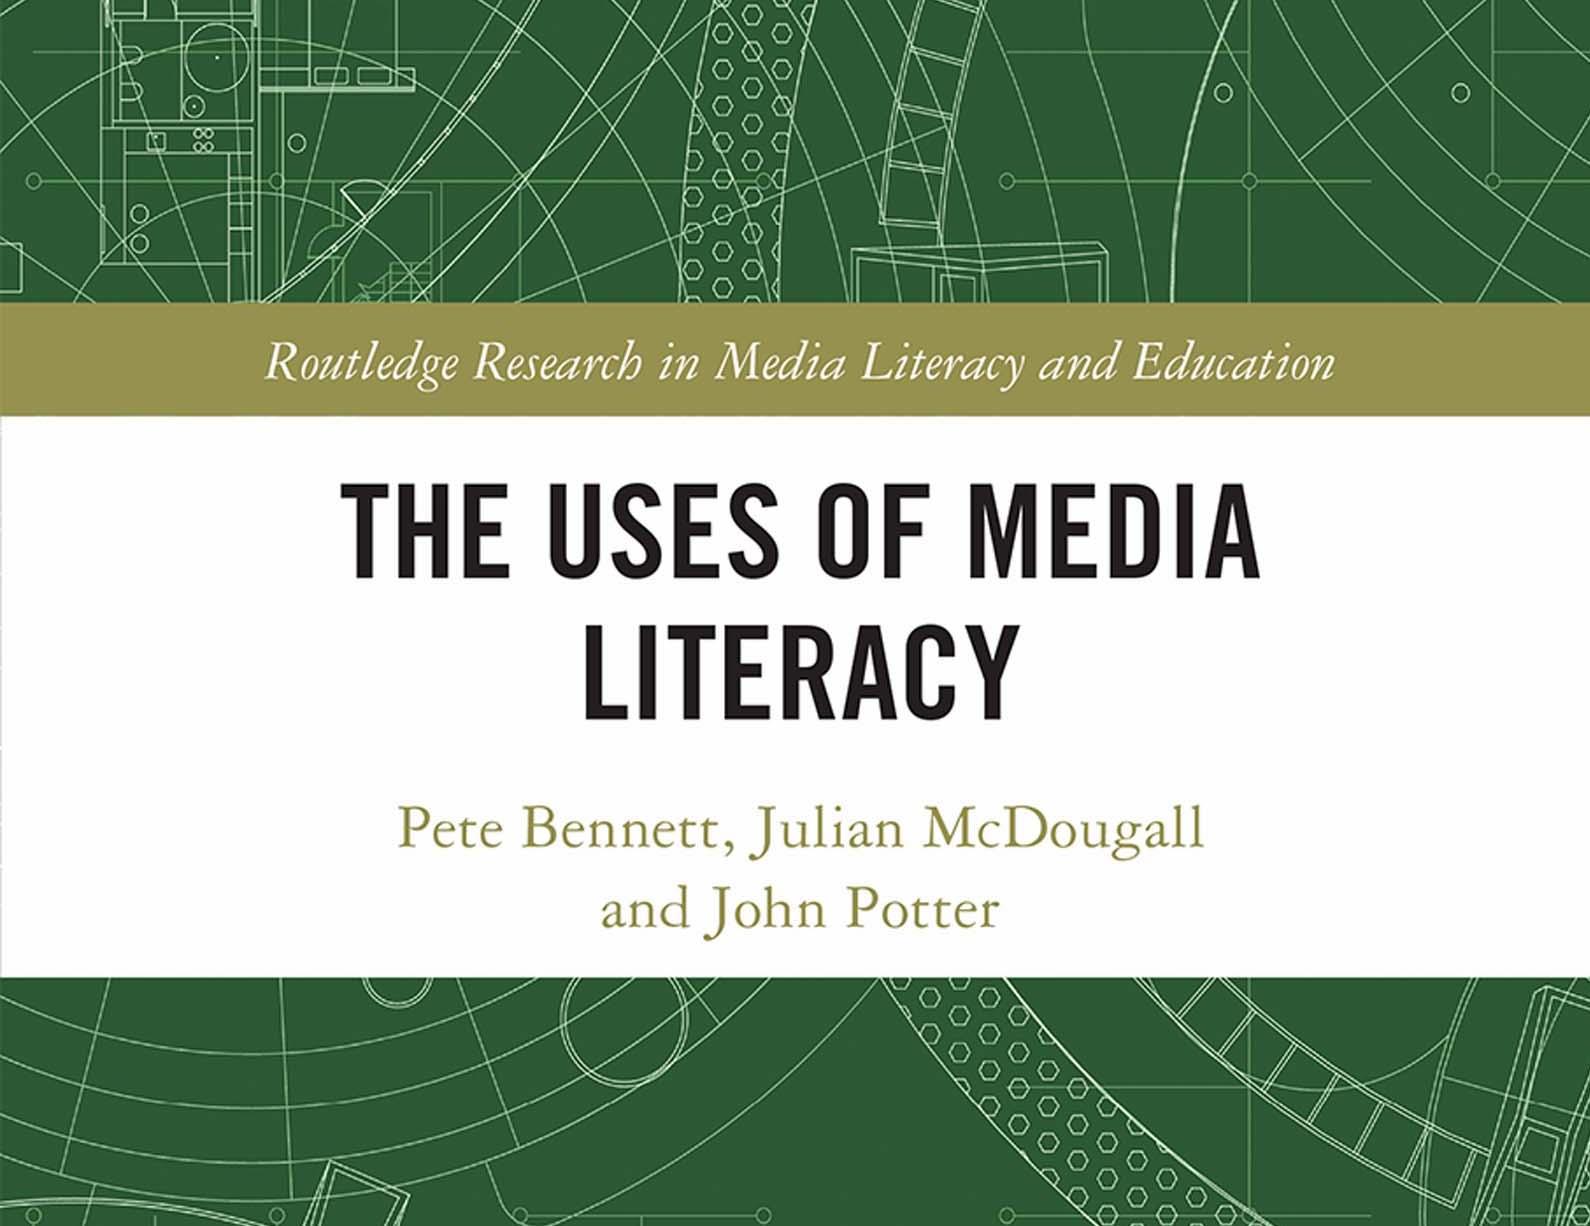 Towards the Dynamic Uses of Media Literacy